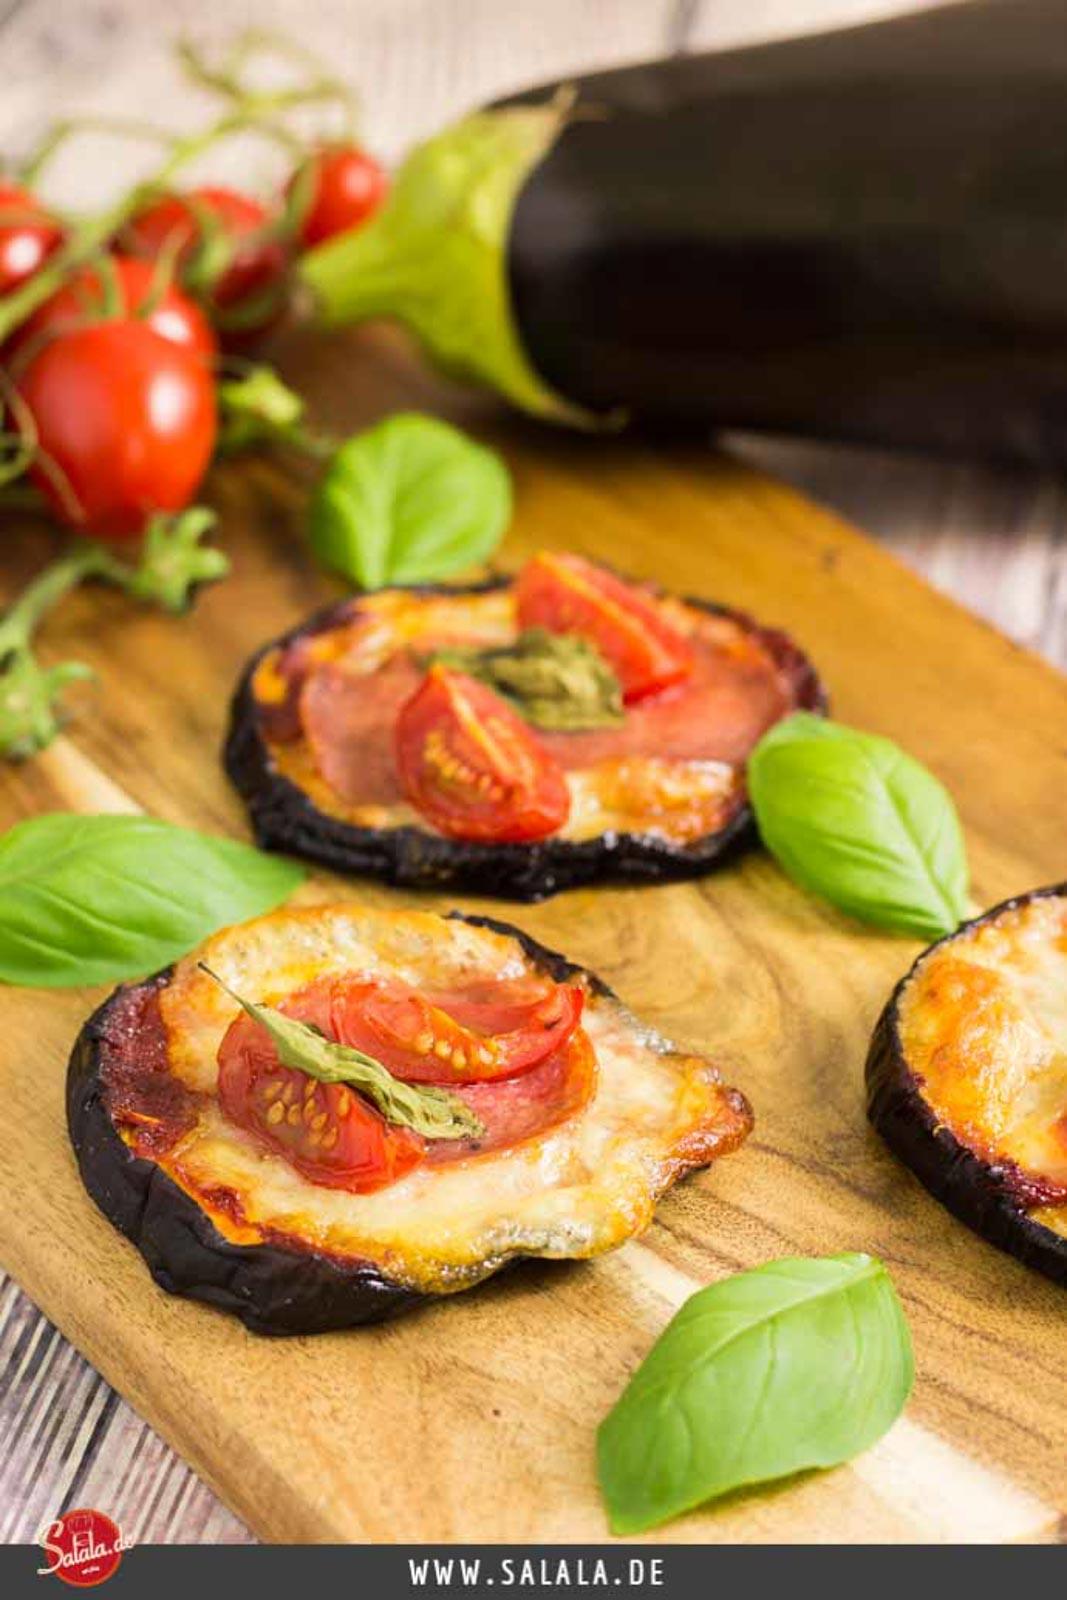 Auberginen Pizza Low Carb Pizza Rezept ohne Kohlenhydrate schnell gemacht #lowcarb #pizza #noflour #sugarfree #zuckerfrei #keto